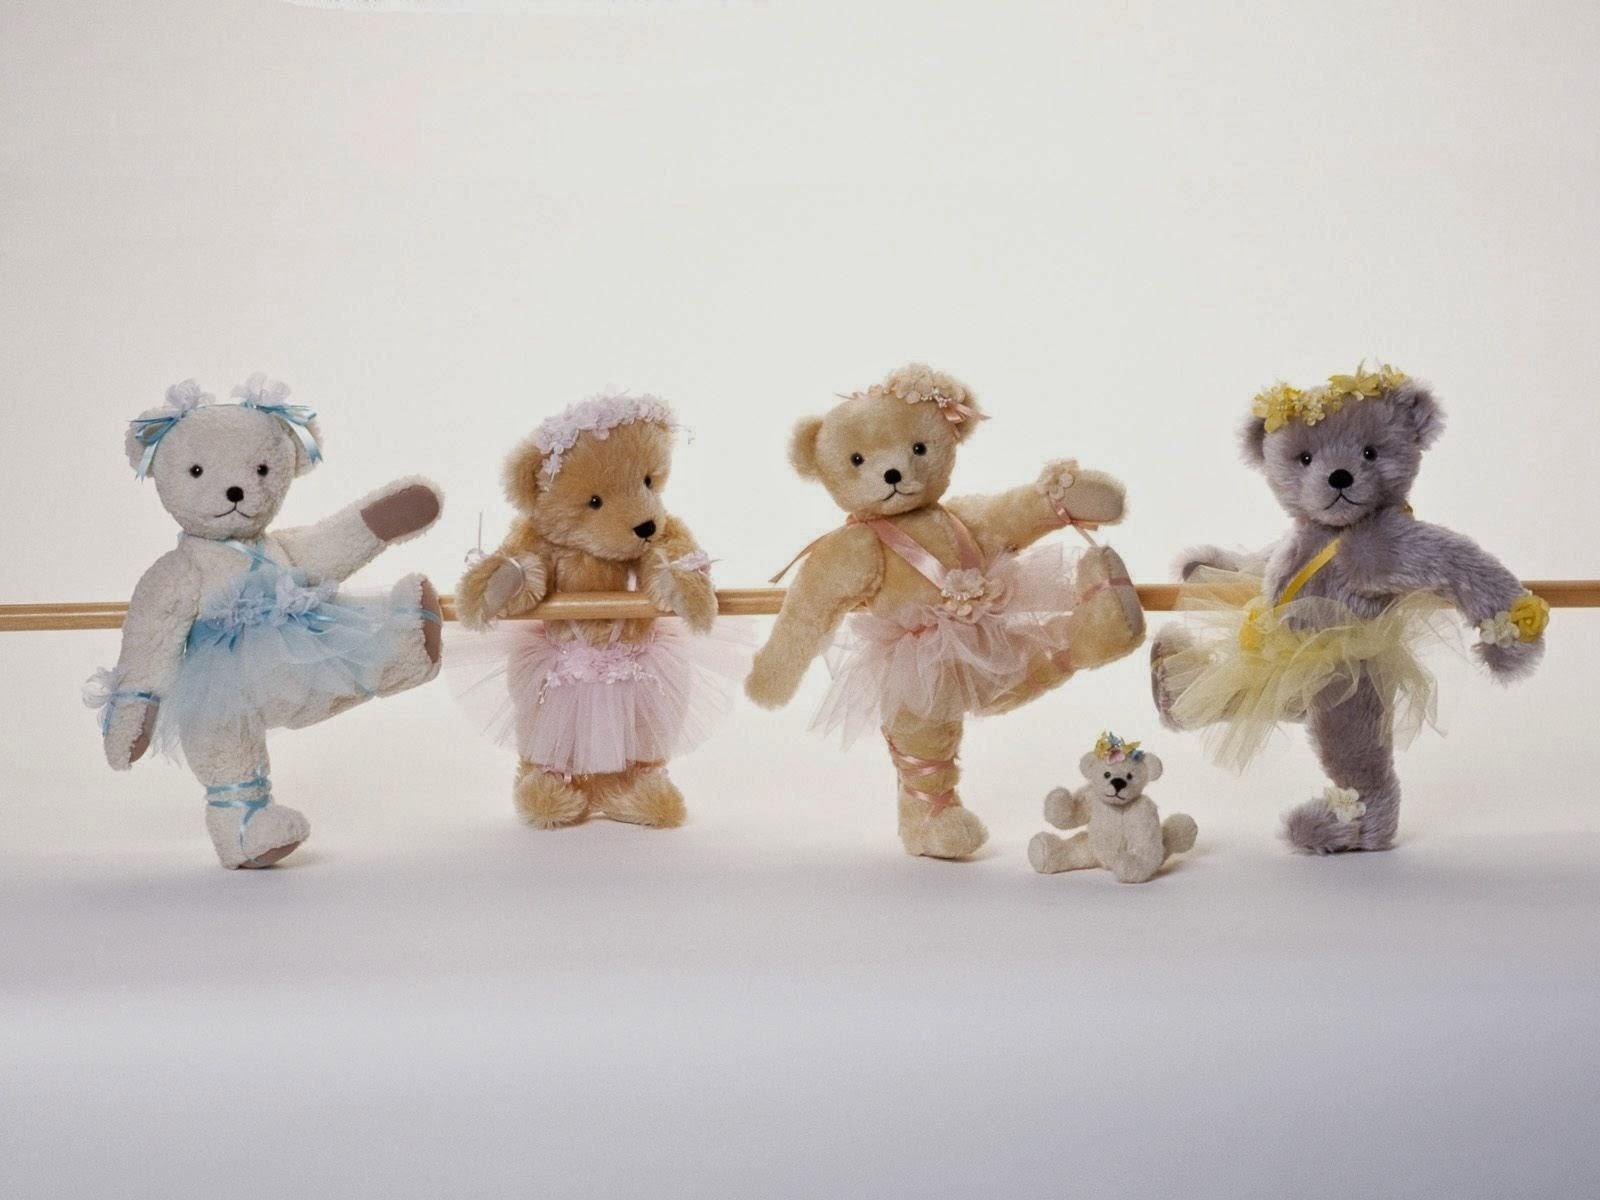 free teddy bear wallpaper wallpapersafari